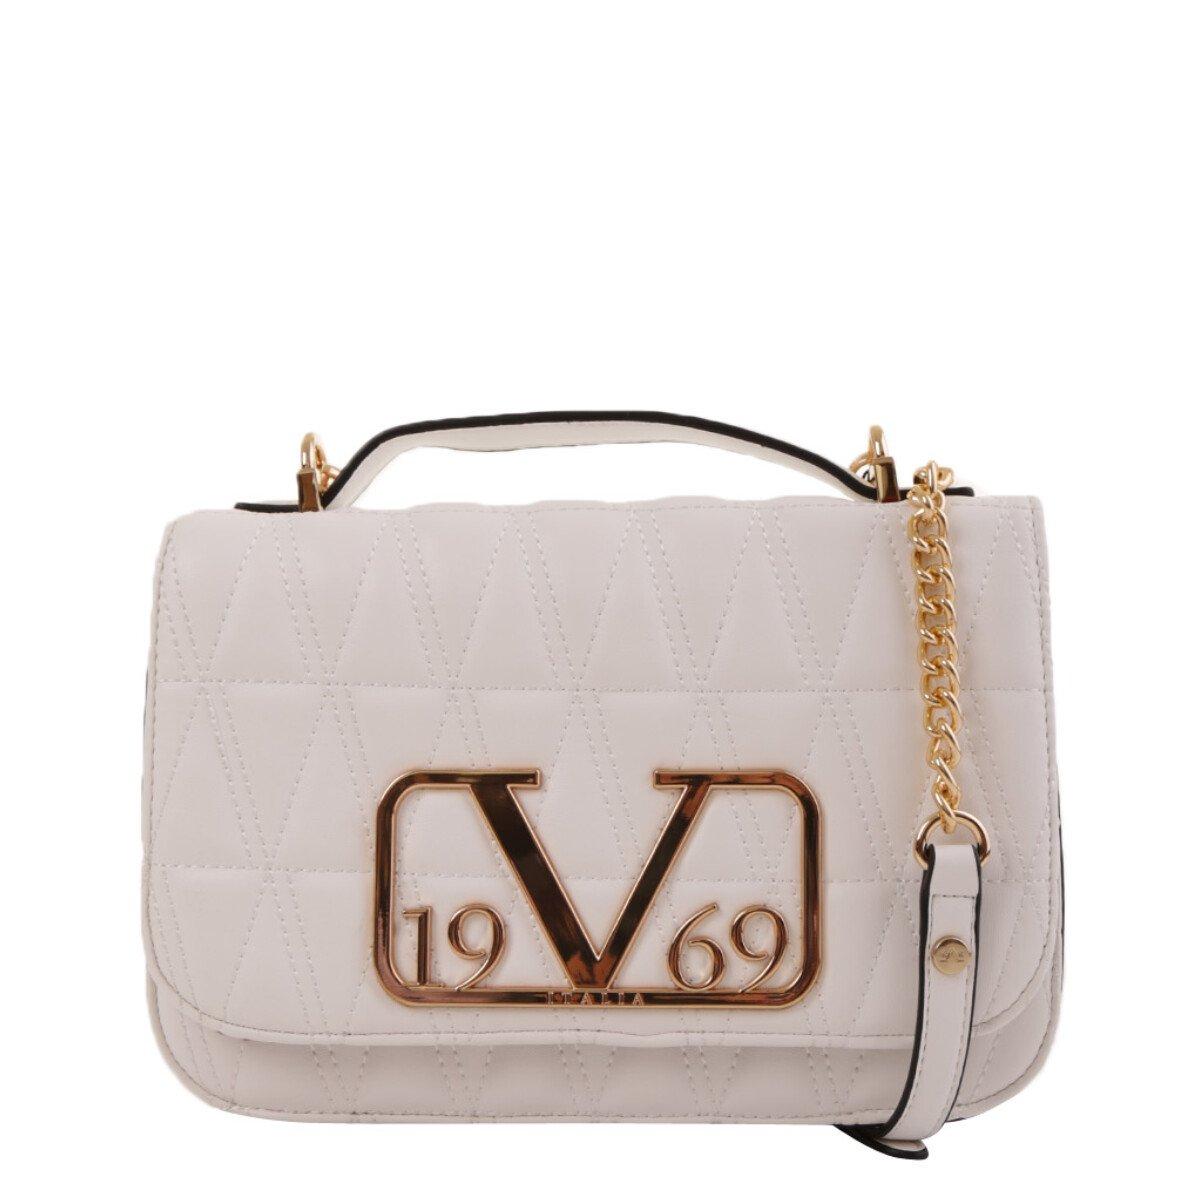 19v69 Italia Women's Shoulder Bag Various Colours 318906 - white UNICA